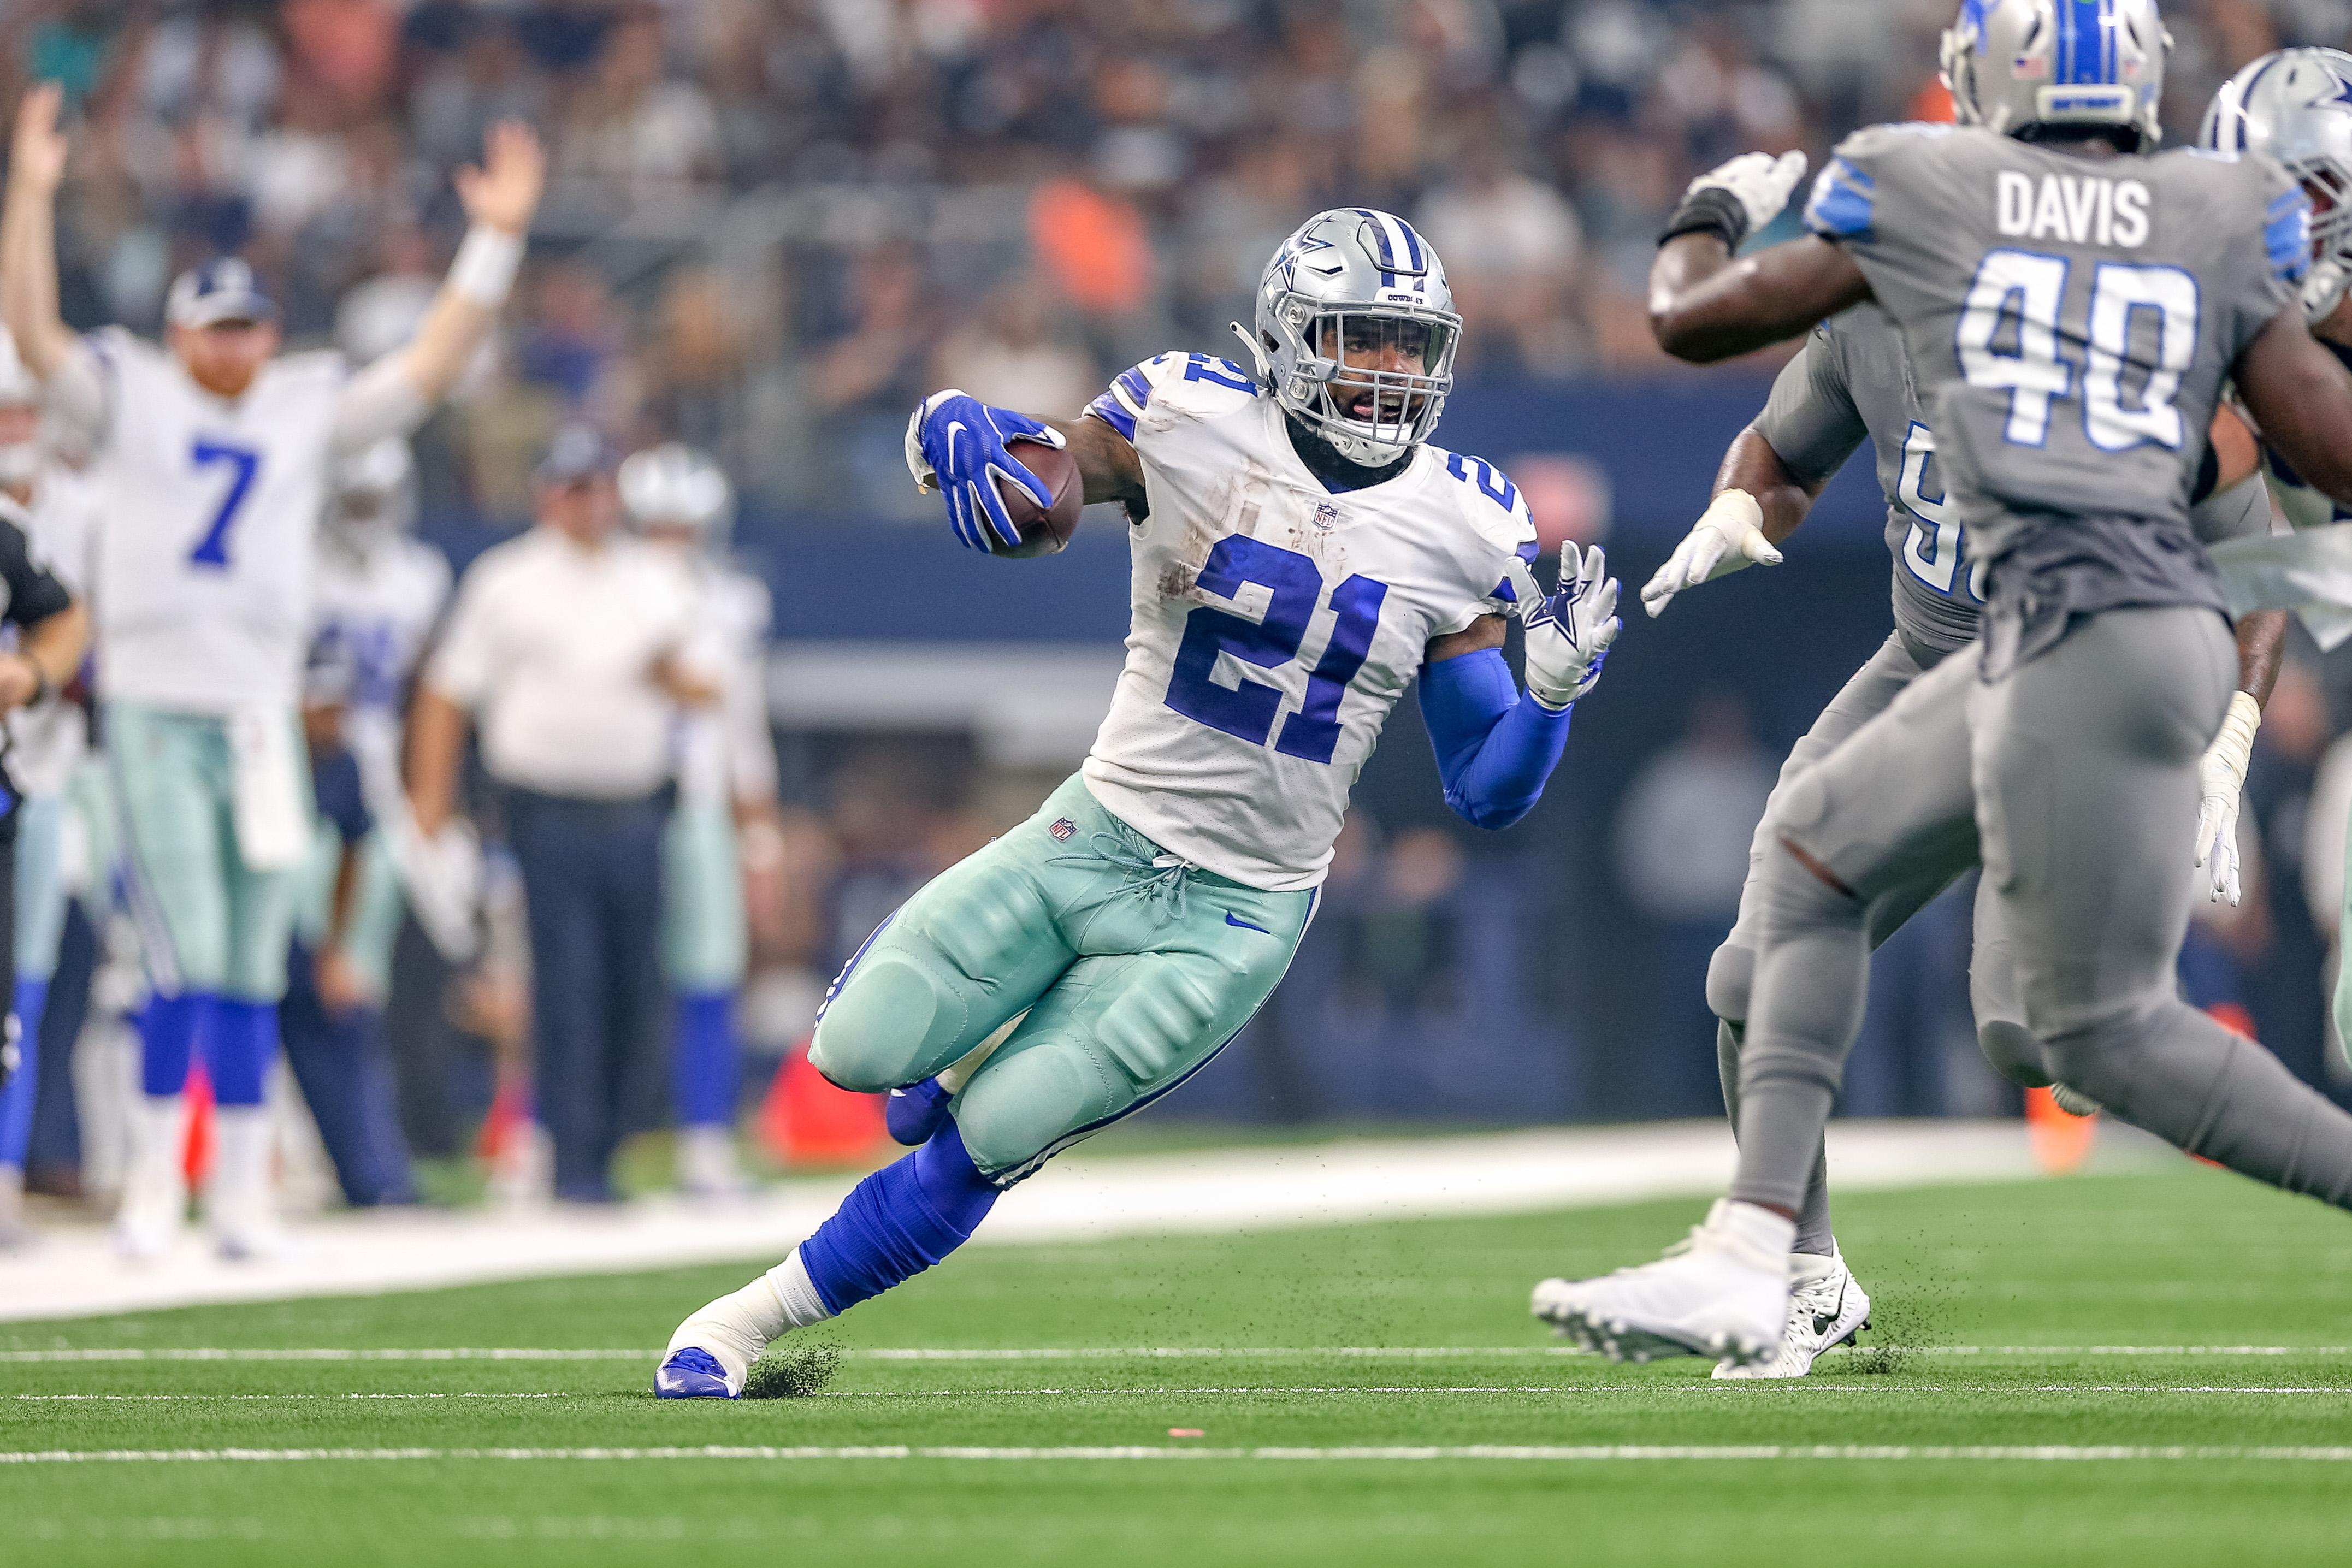 NFL: SEP 30 Lions at Cowboys